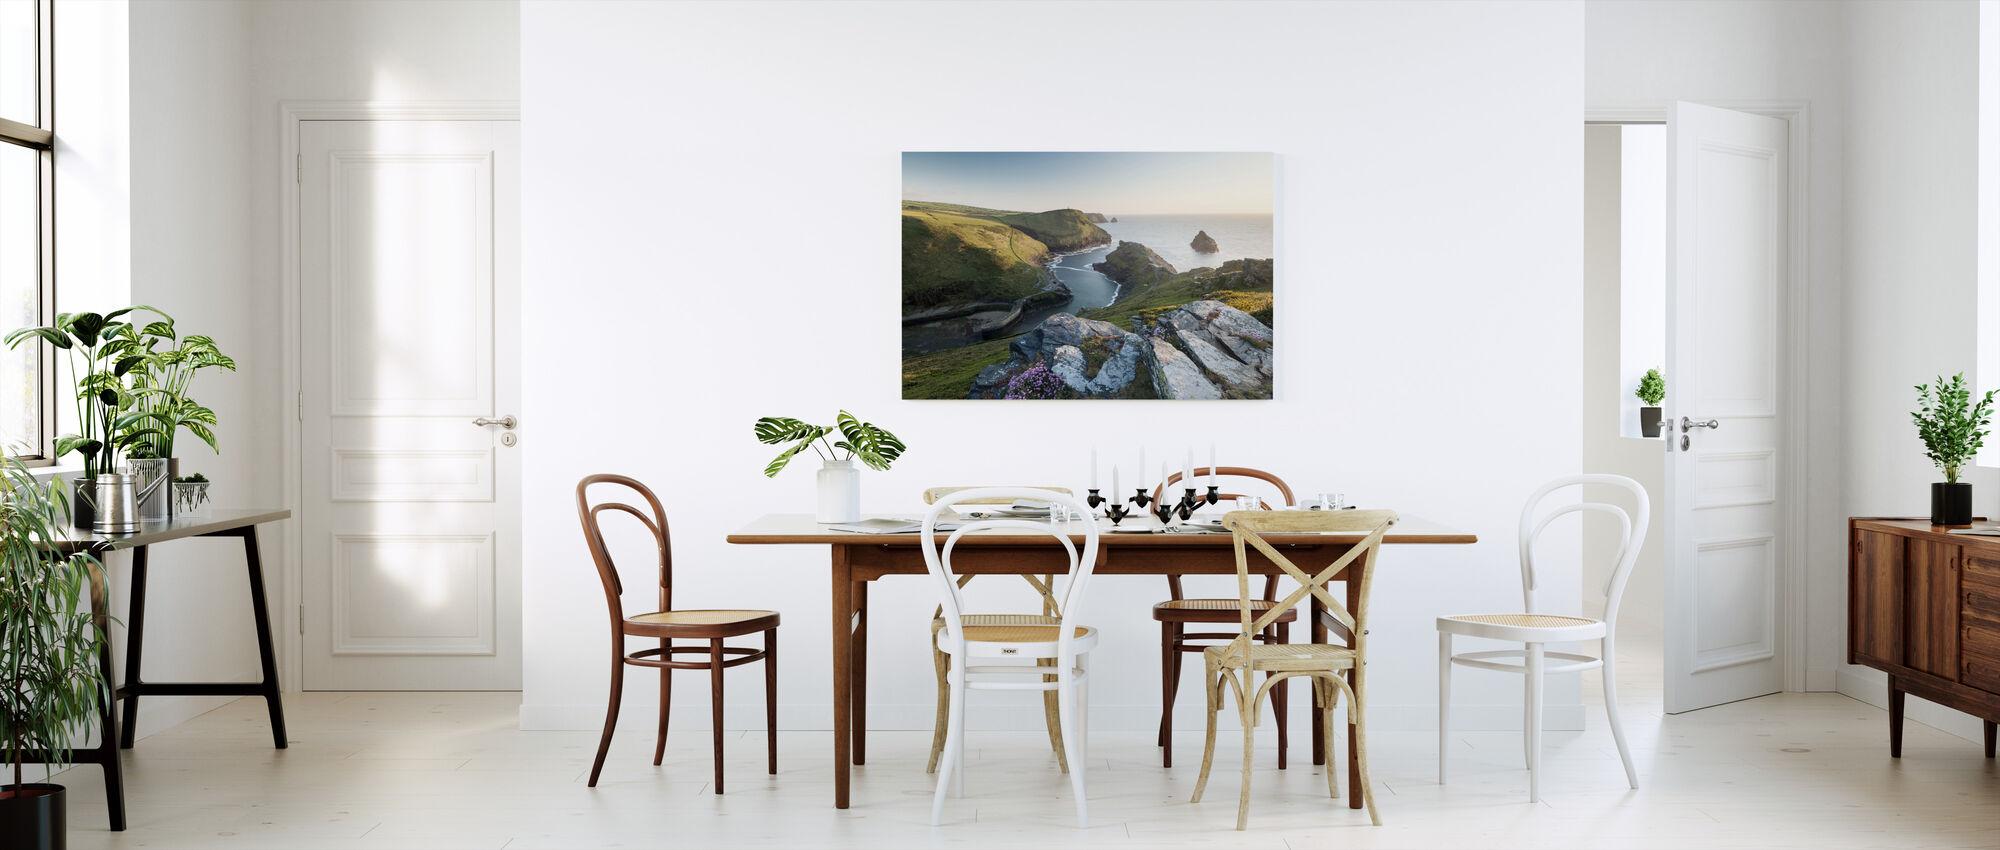 Tall View - Canvas print - Kitchen